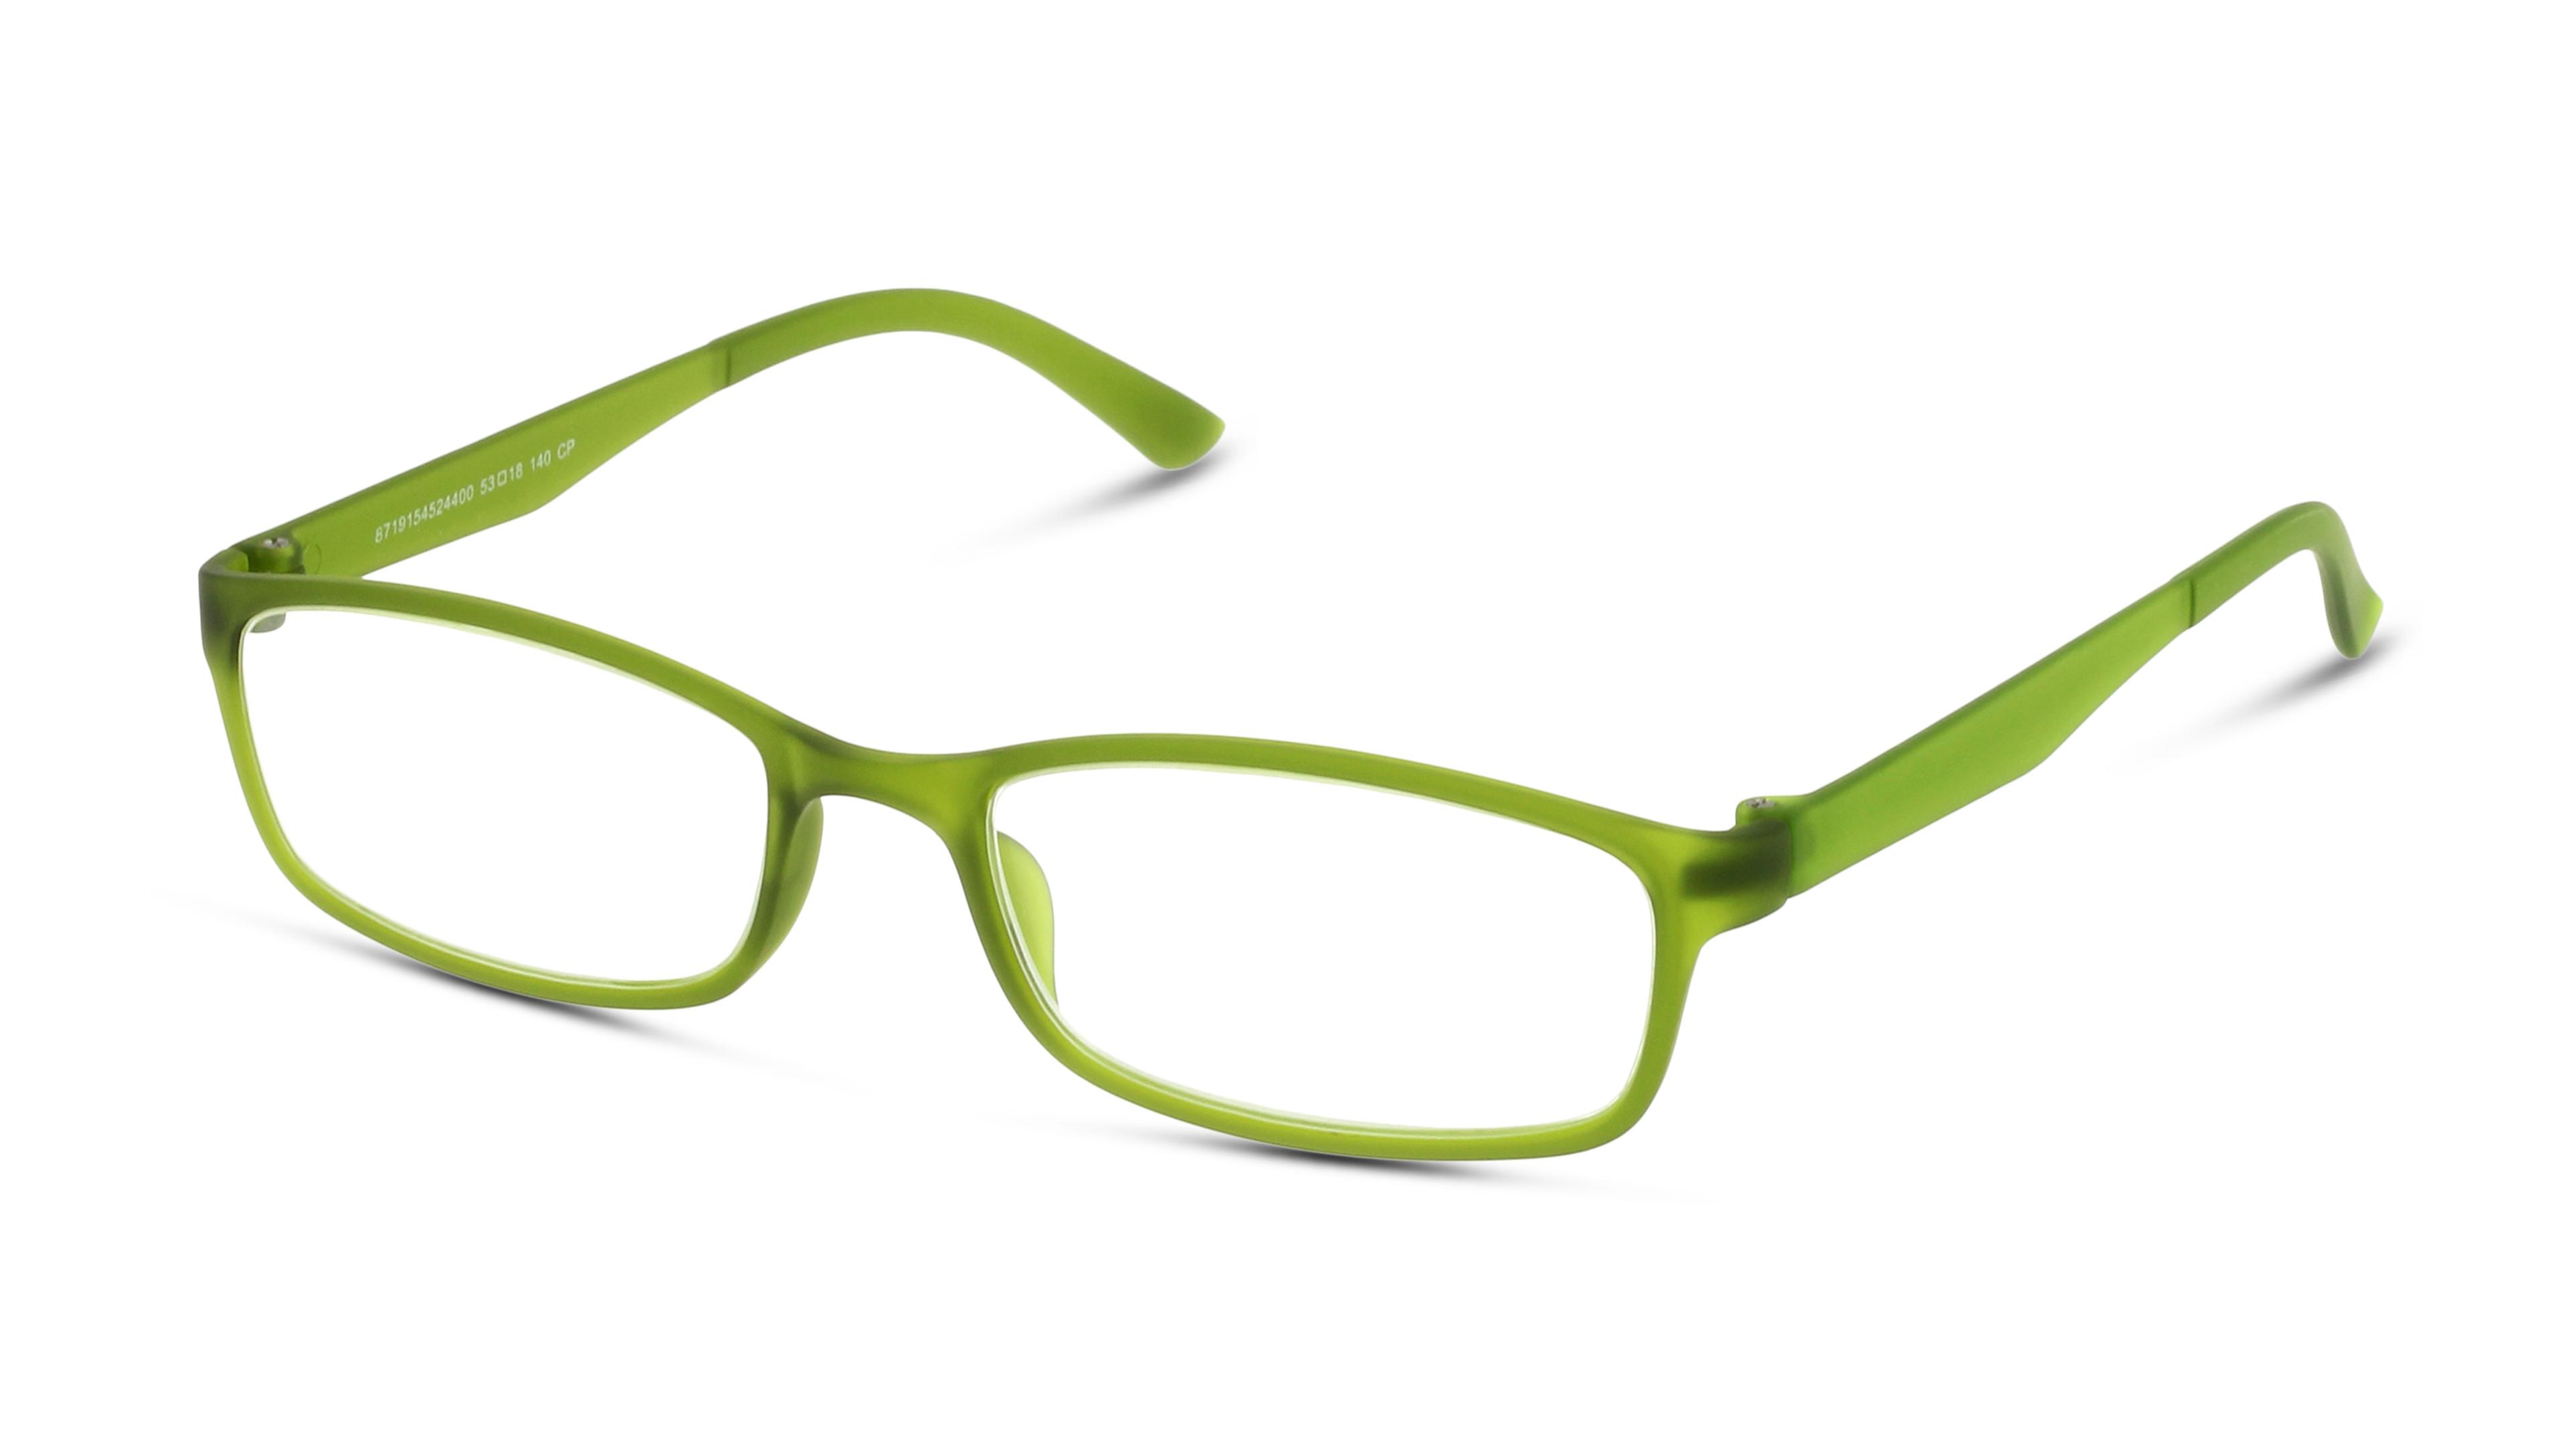 8719154524400-angle-03-gv-library-hfcm06-Eyewear-green-green